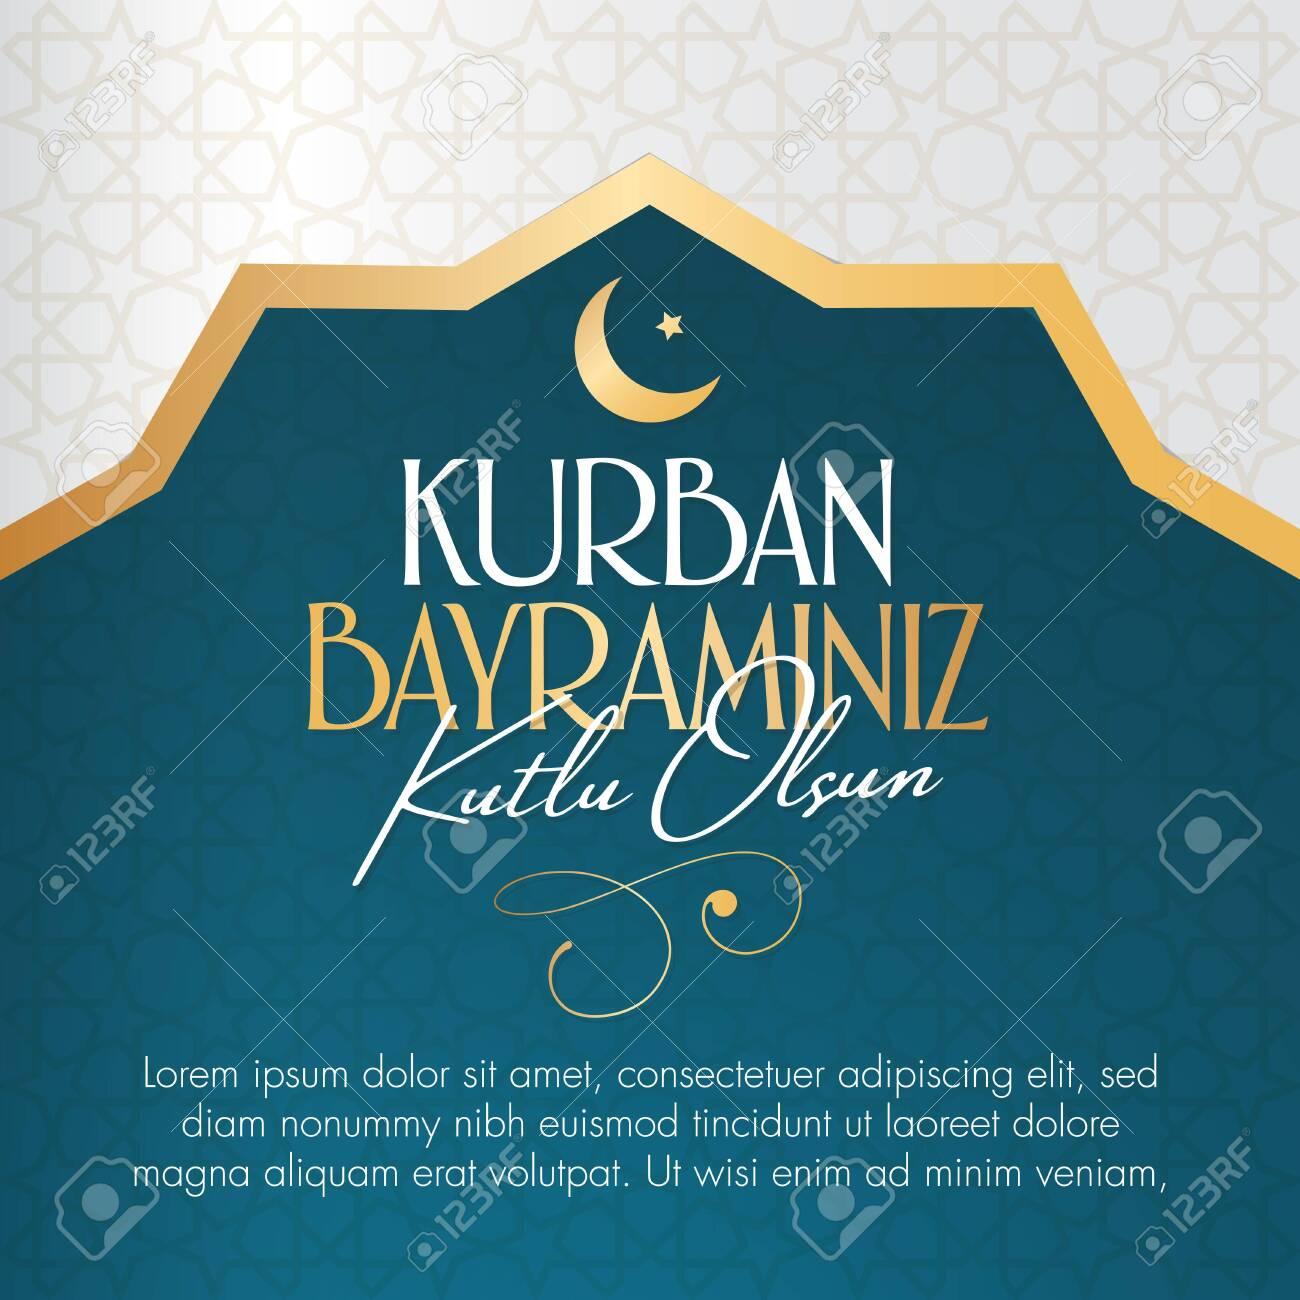 Feast of the Sacrifice Greeting (Eid al-Adha Mubarak) Holy days of muslim community. Billboard, Poster, Social Media, Greeting Card template. - 128154067